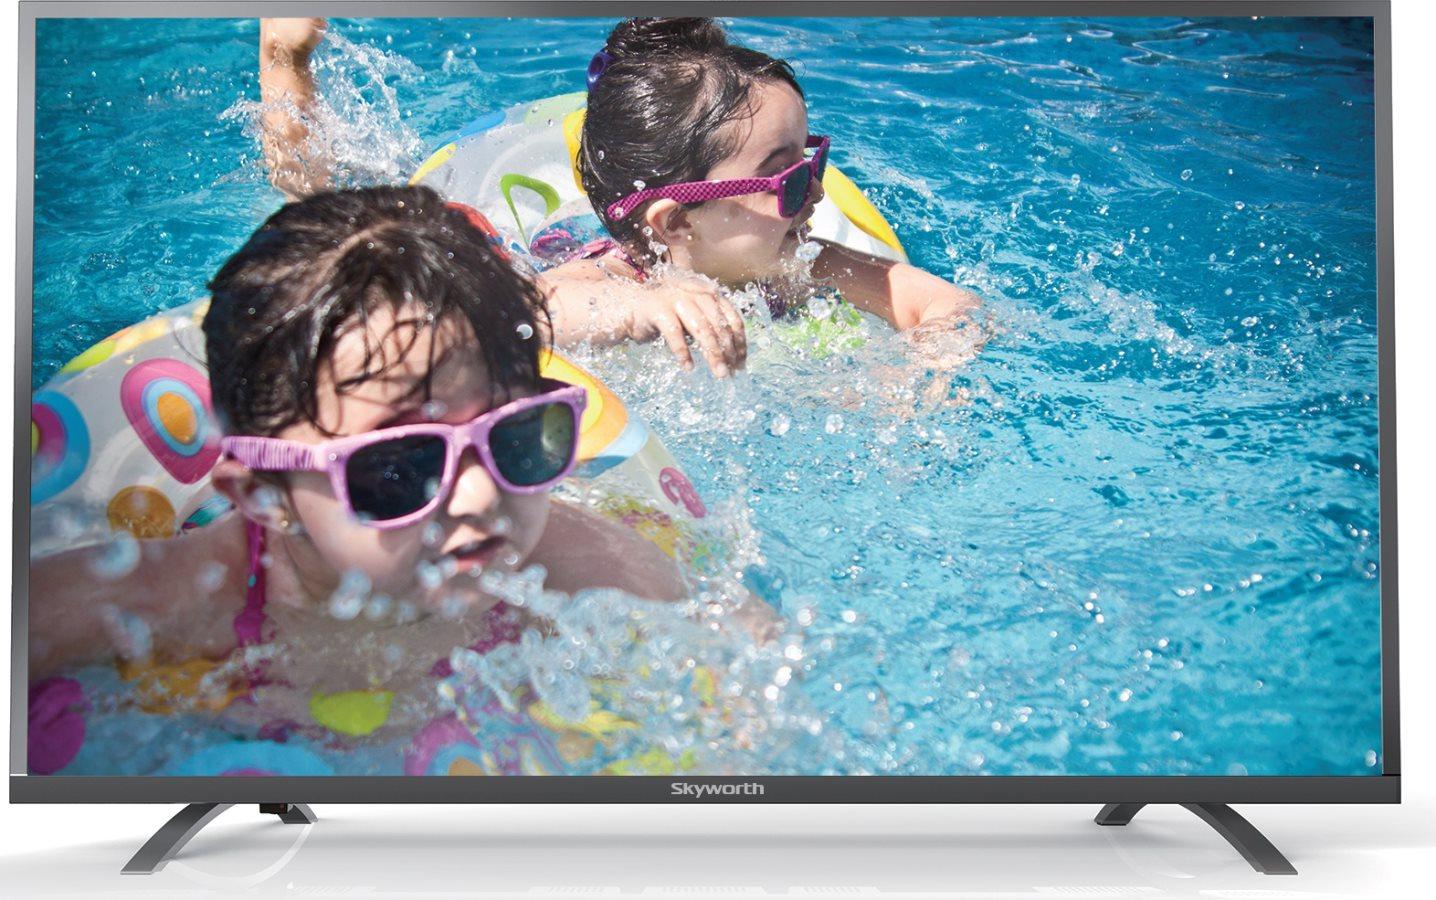 Skyworth TV LED 43 4K UHD Digitale Terrestre Dolby USB HDMI Hdr 43E5600 ITA